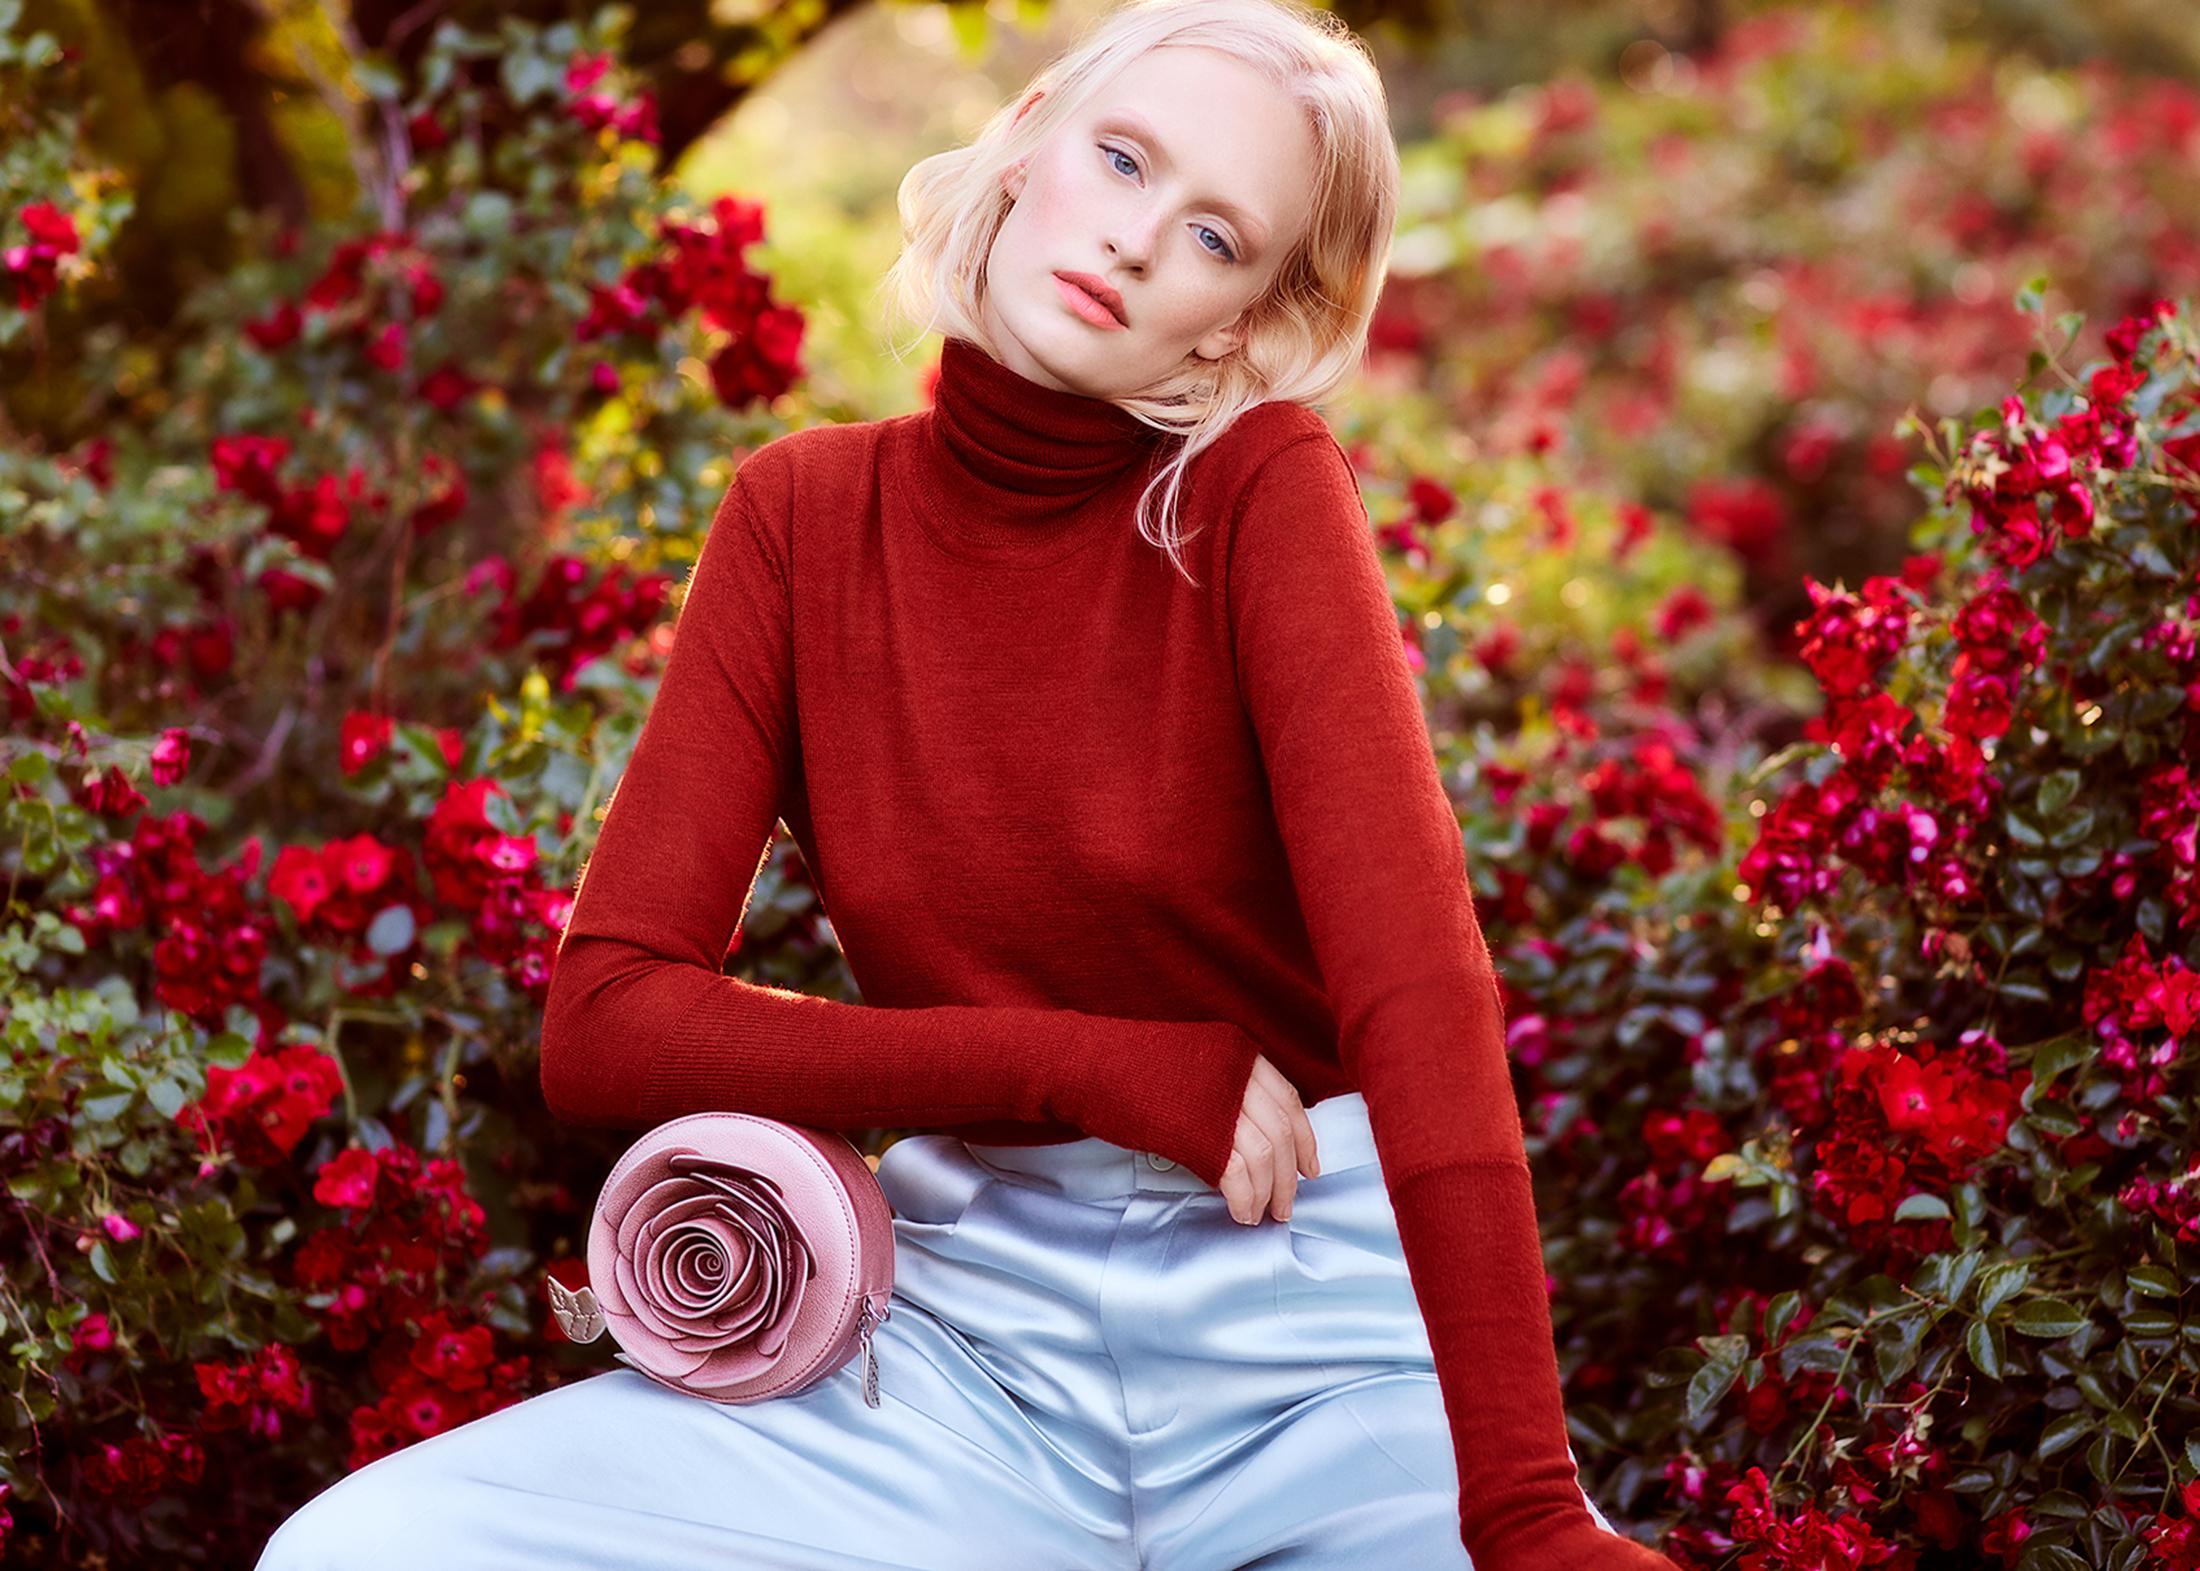 FashionPhotographer_FashionEditorial_By_BriJohnson_00010083.jpg